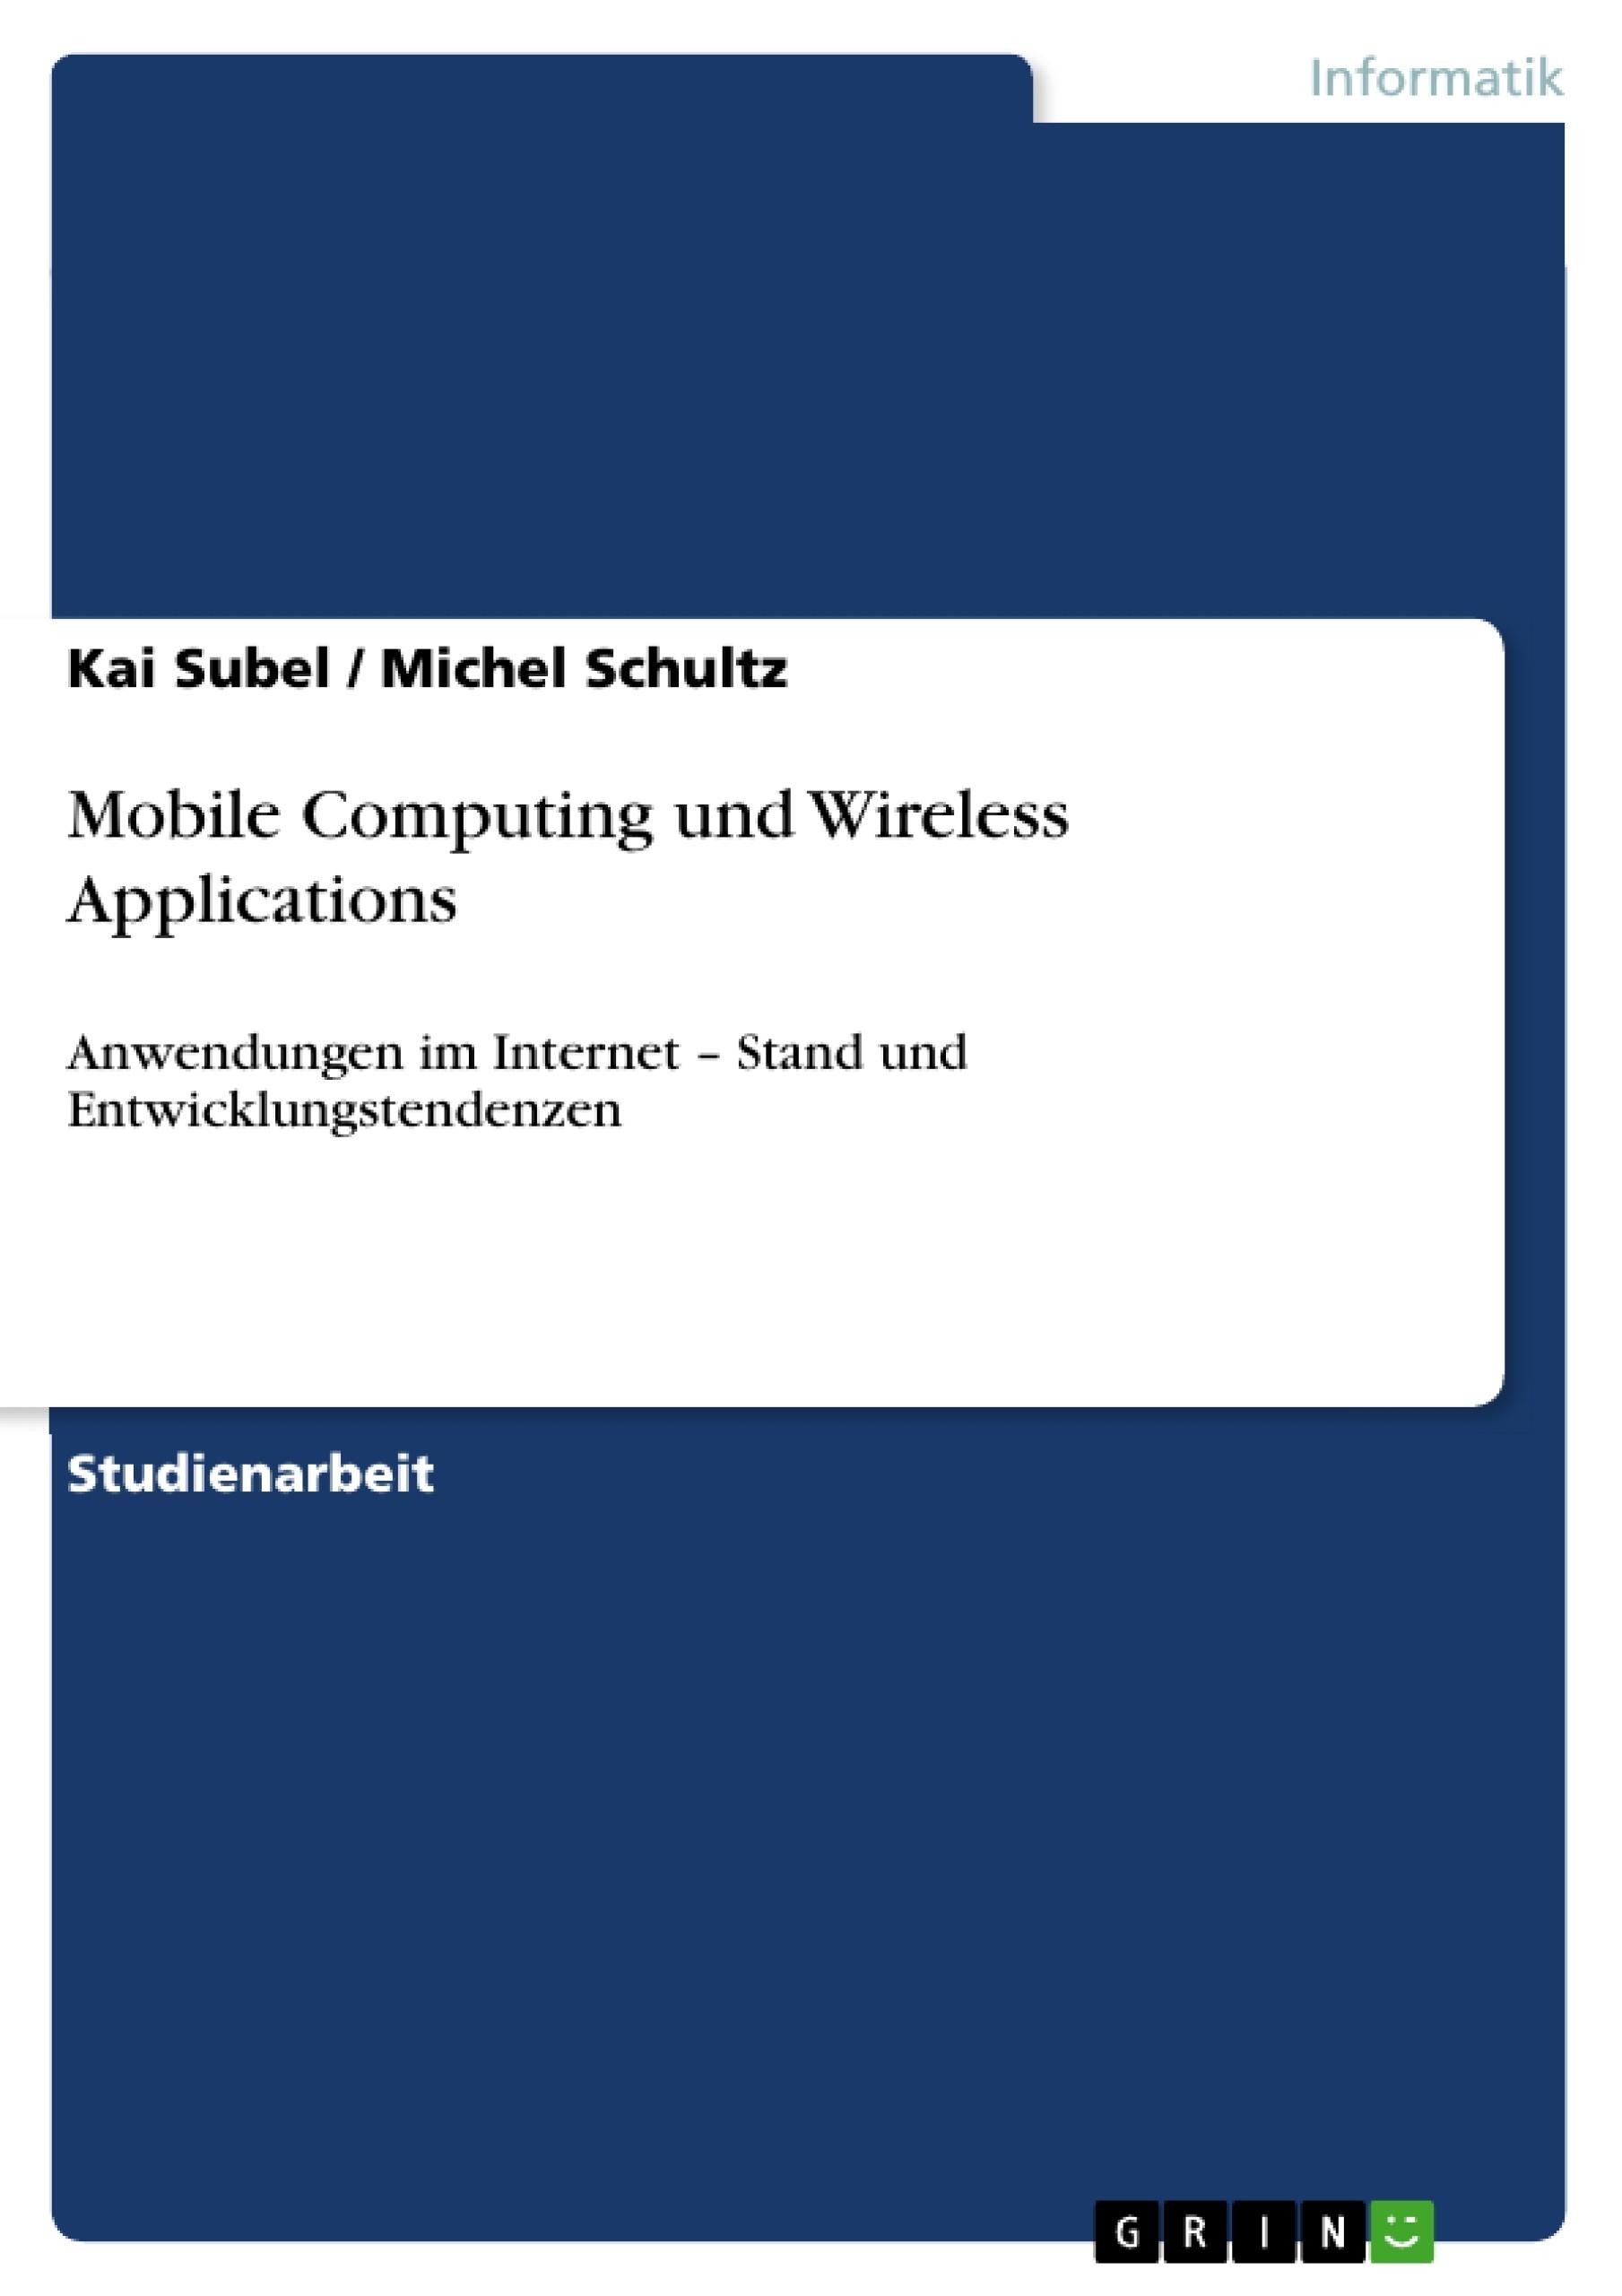 Titel: Mobile Computing und Wireless Applications